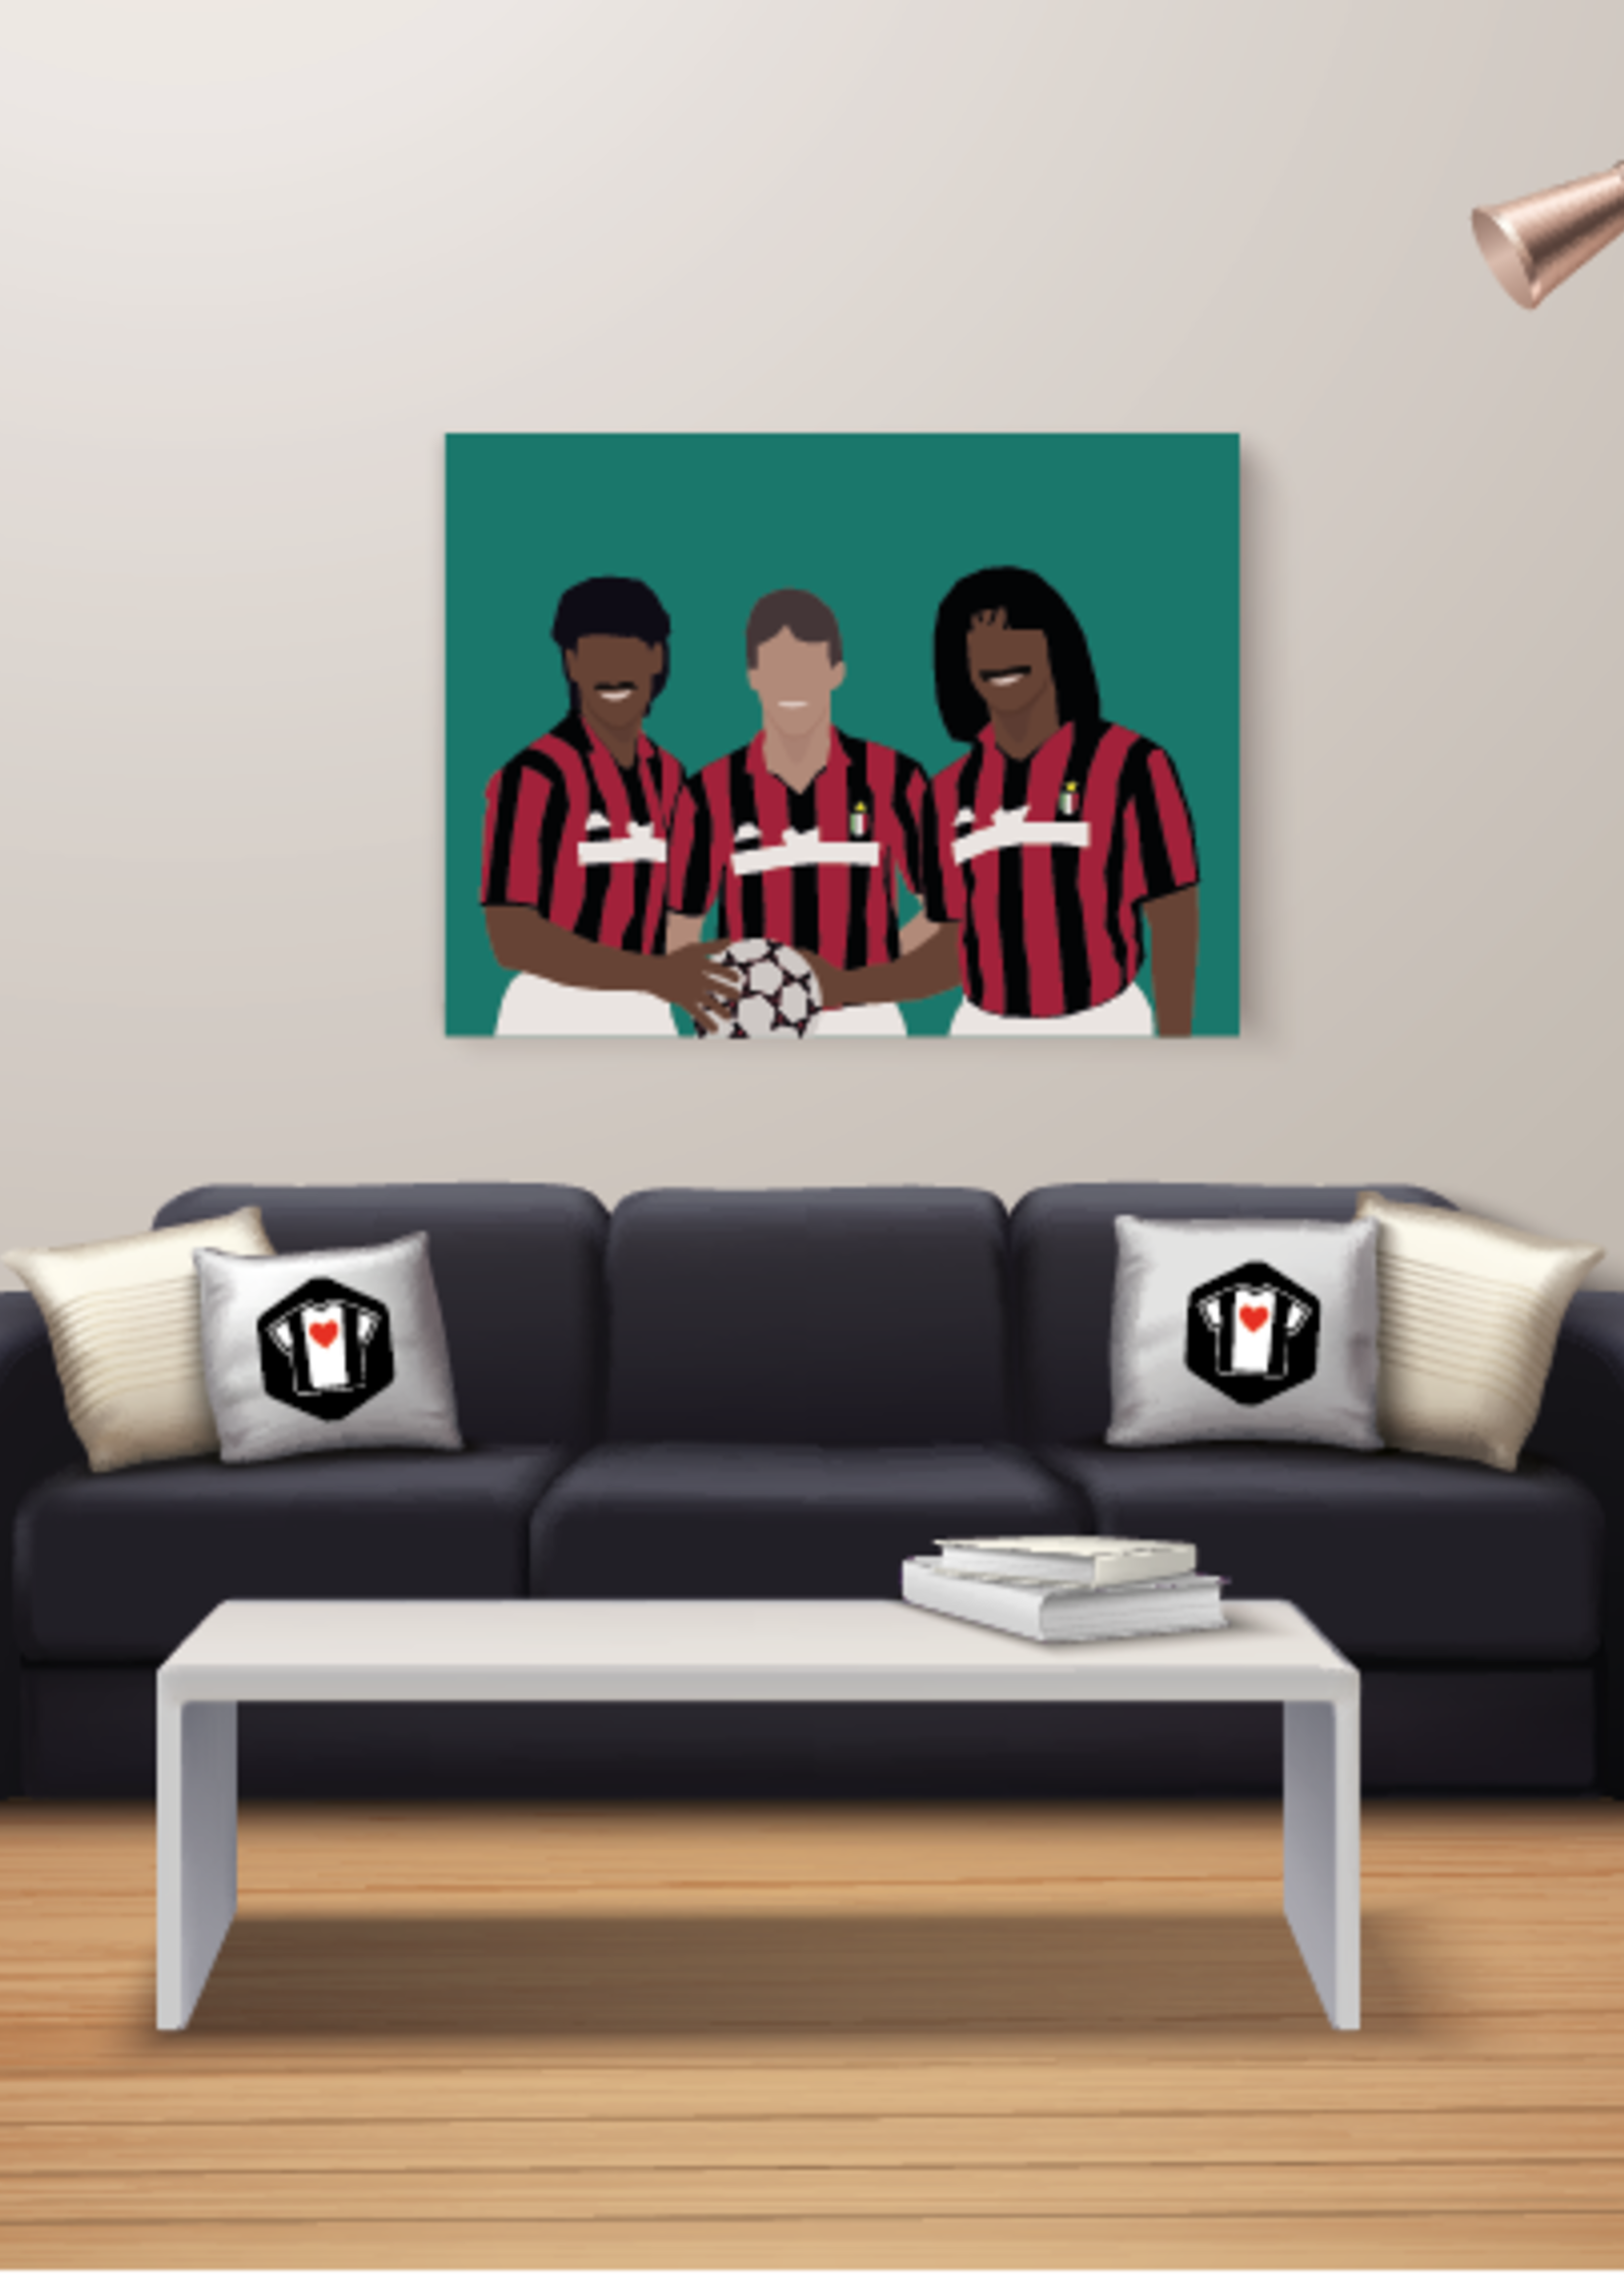 "We Love Football Art ""Die grossen drei"" We Love Football Art"